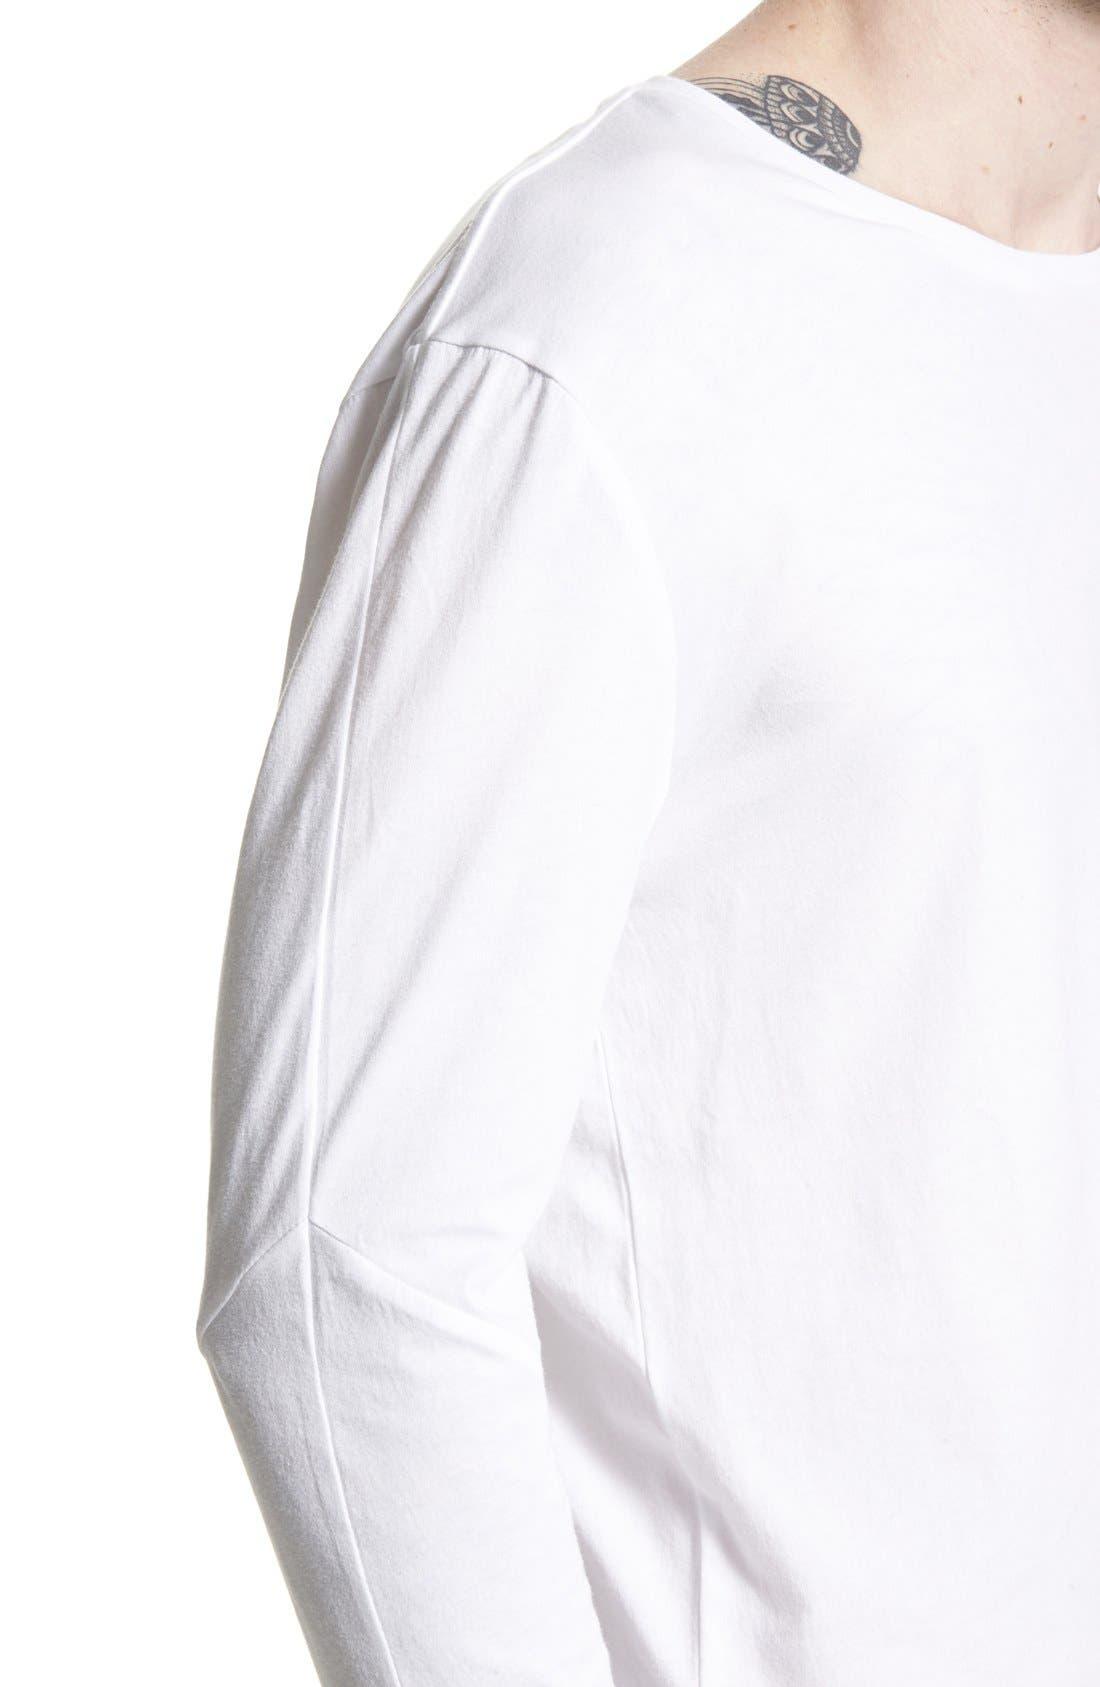 Flintlock Longline Long Sleeve T-Shirt,                             Alternate thumbnail 3, color,                             WHITE